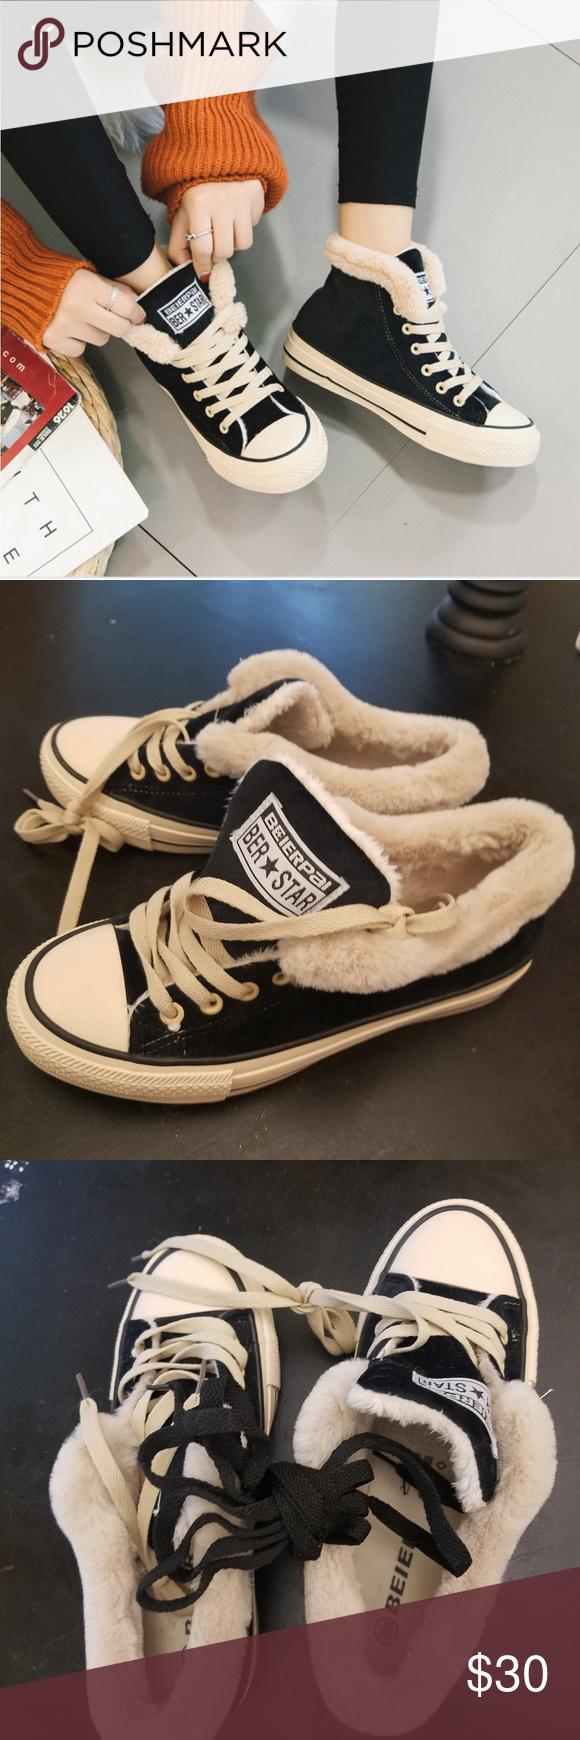 NEW Beierpai ber*stars sneakers   Star